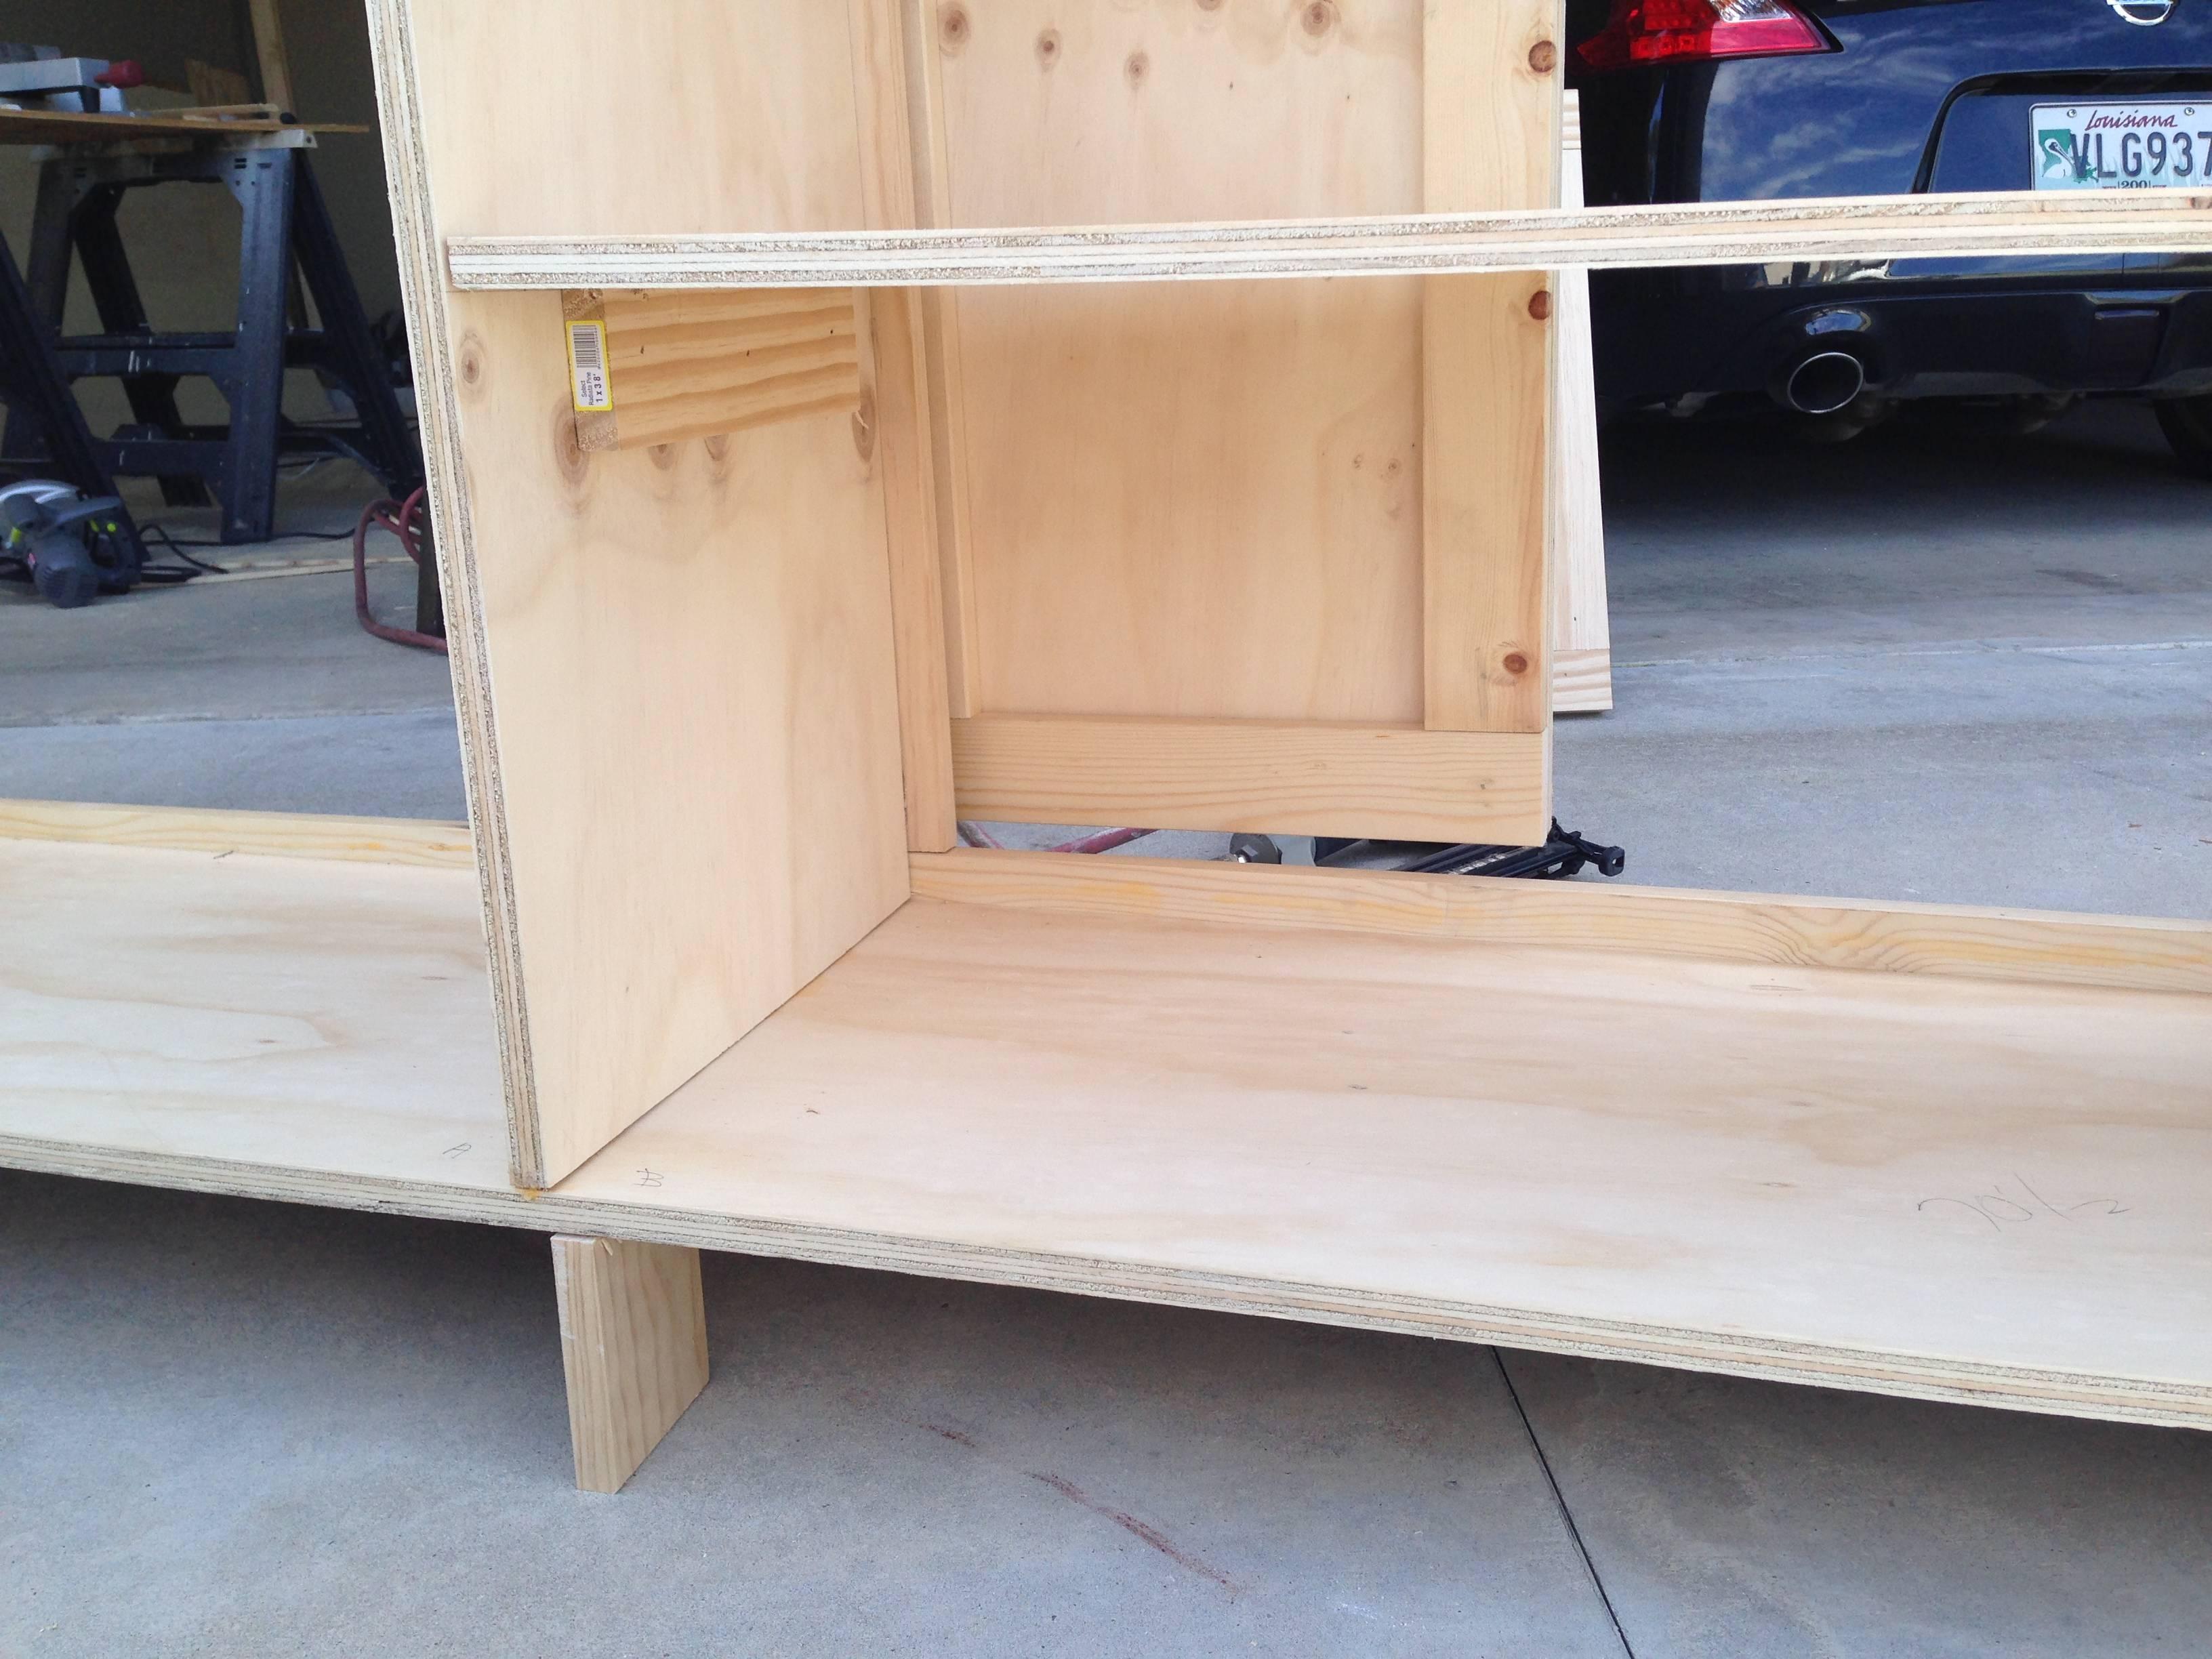 Diy Sideboard | The Sweet Life Throughout Diy Sideboards (View 12 of 15)